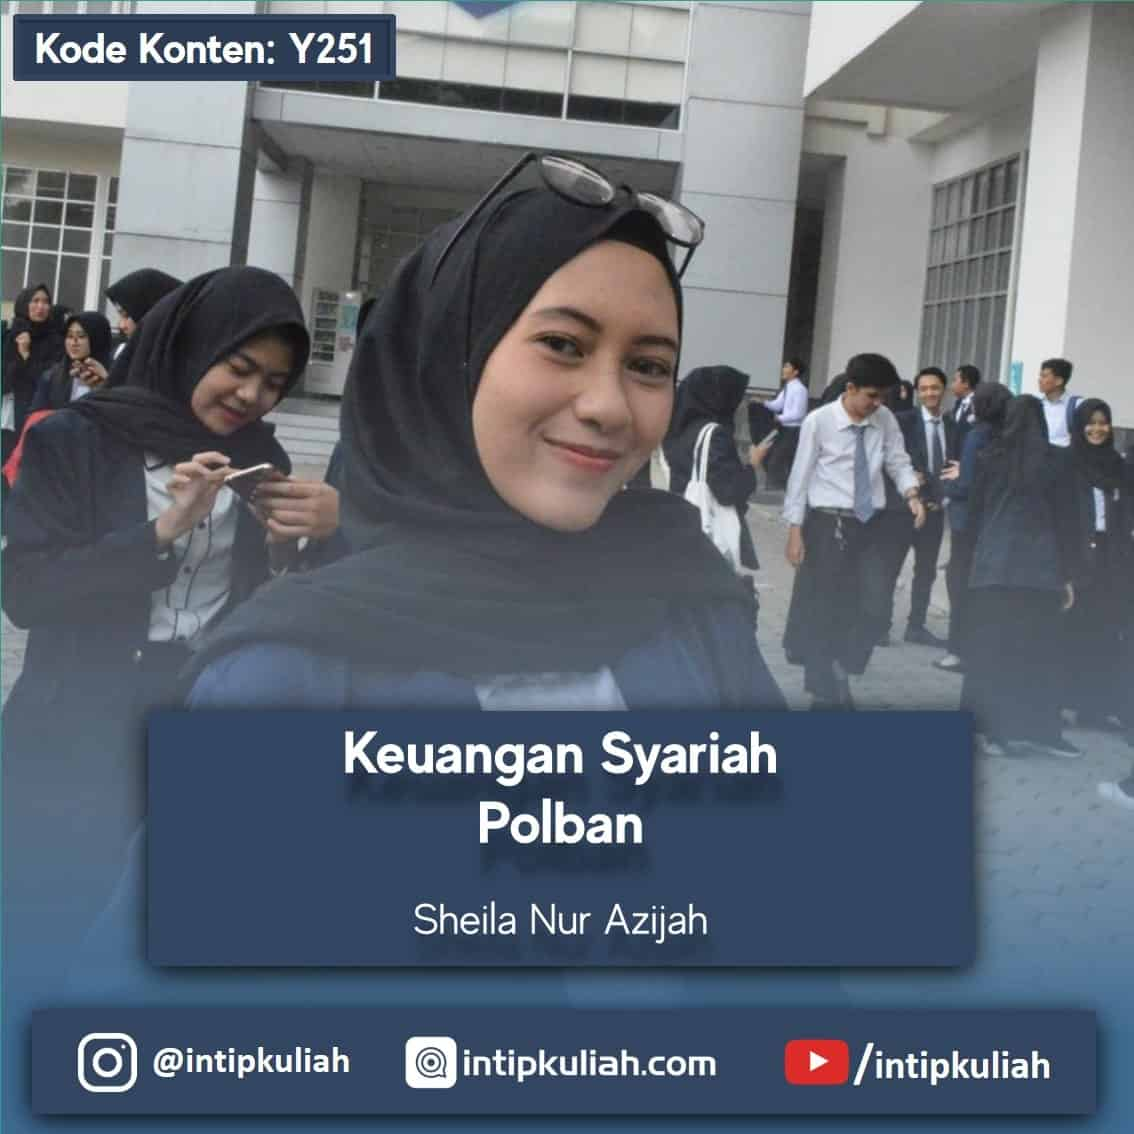 Keuangan Syariah Polban (Sheila)